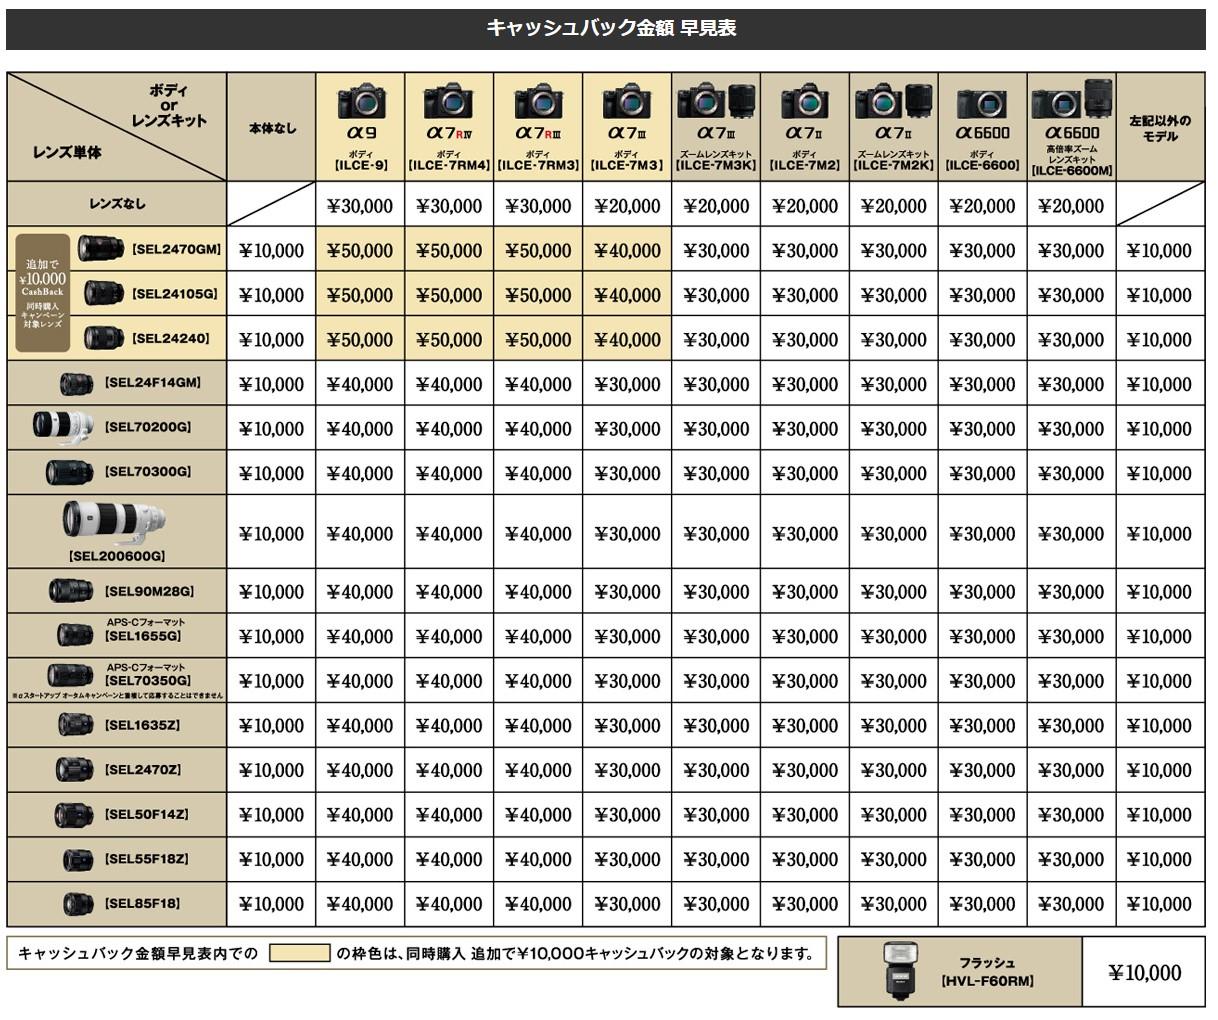 Eマウント誕生10周年記念 αミラーレス サンクスキャンペーン 2020.08.28~2020.10.11 早見表